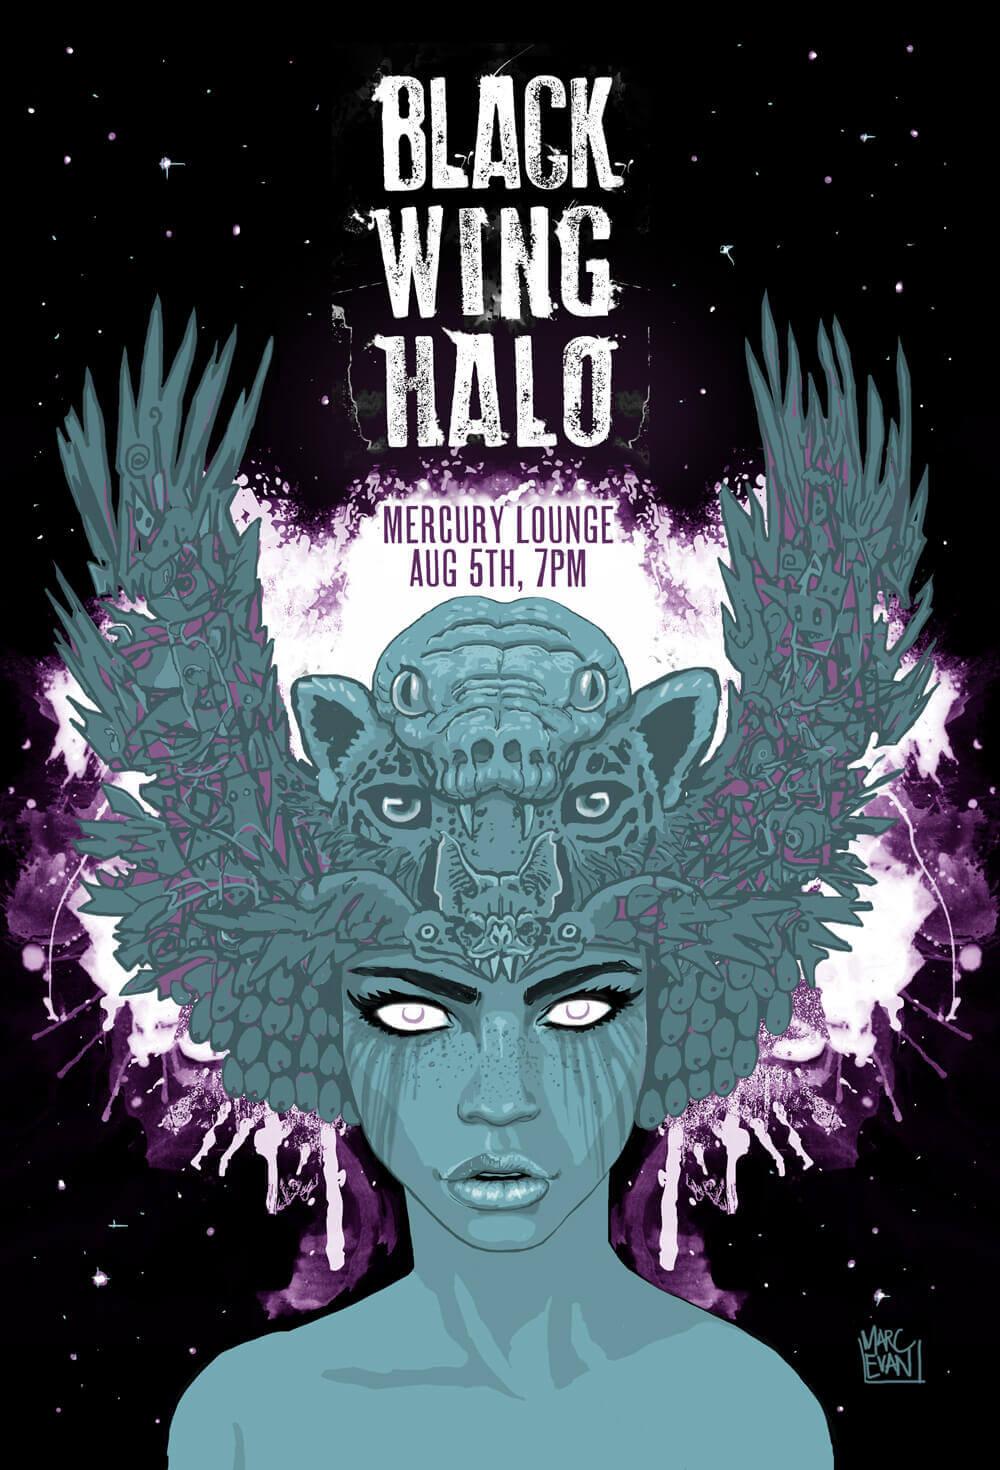 Black Wing Halo by Marc Evan